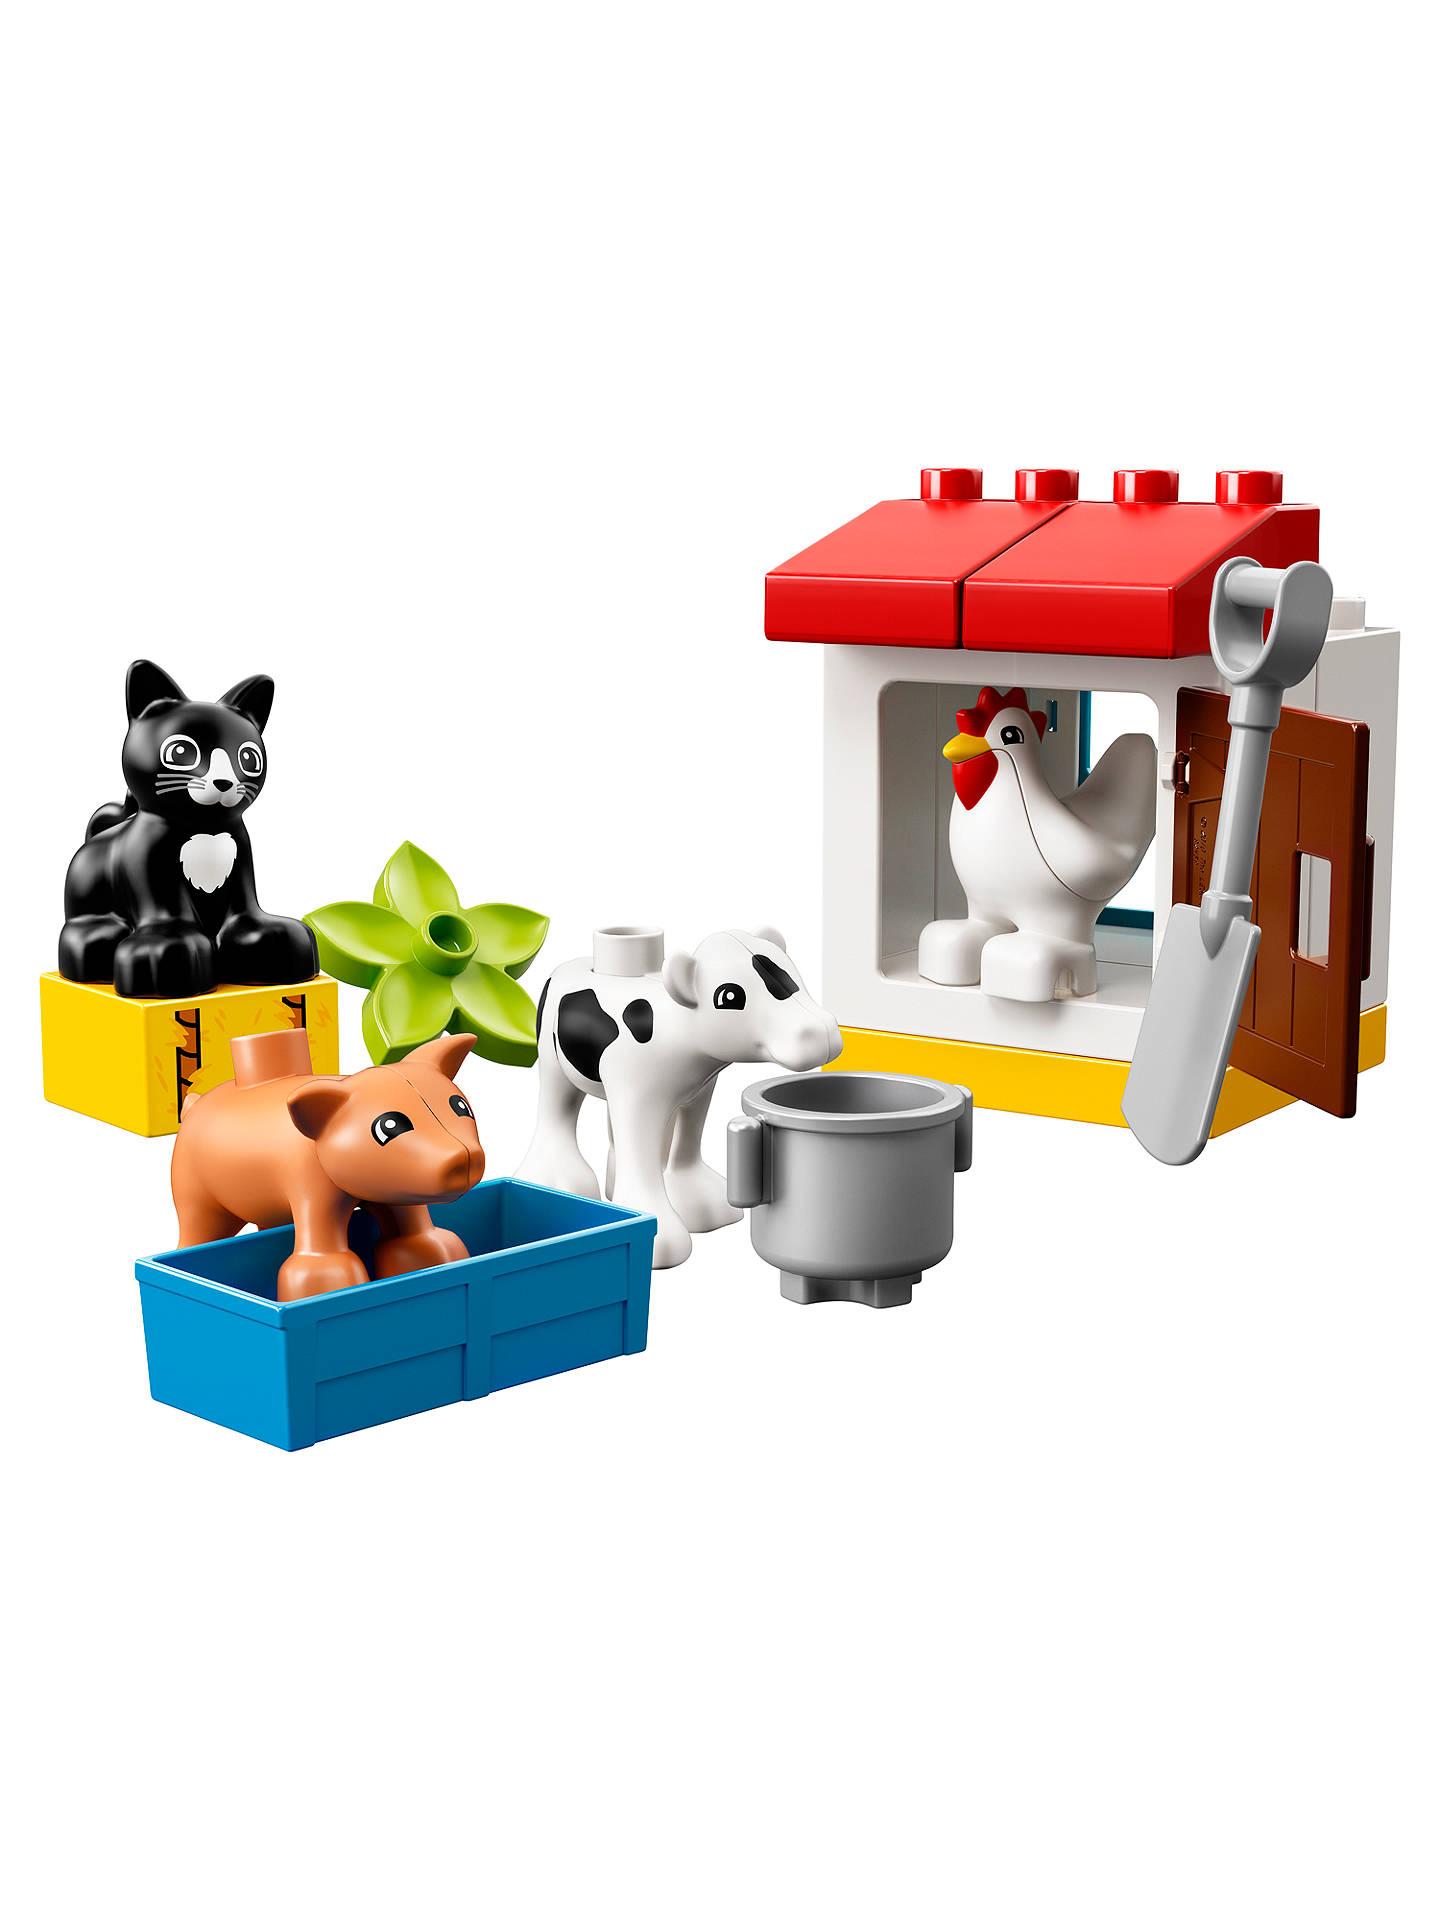 Lego Duplo 10870 Farm Animals £6.50 @ John Lewis & Partners